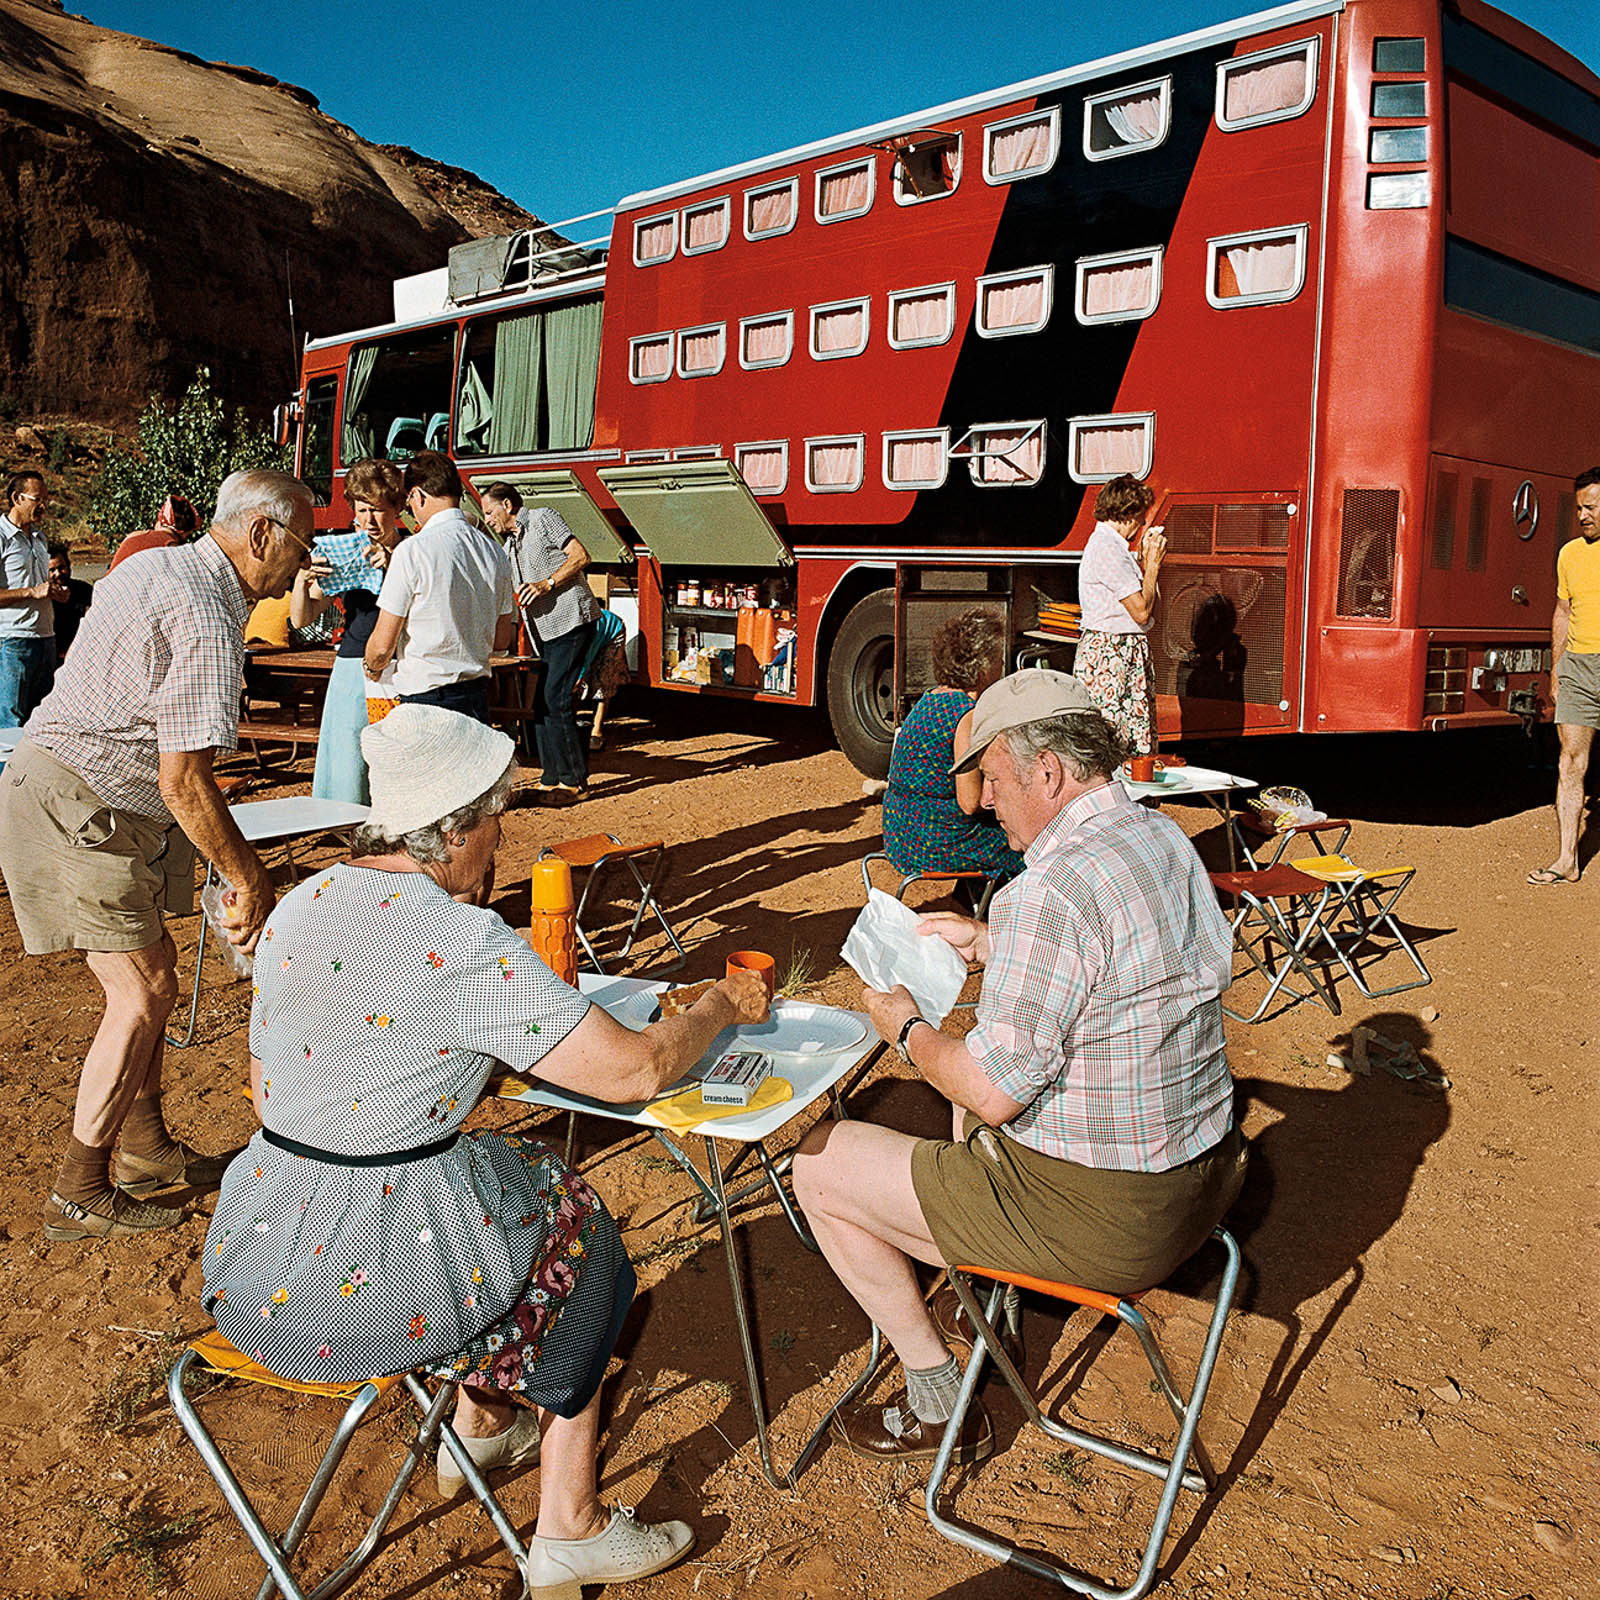 Sleeper Tour Bus at Goulding, Arizona 1980